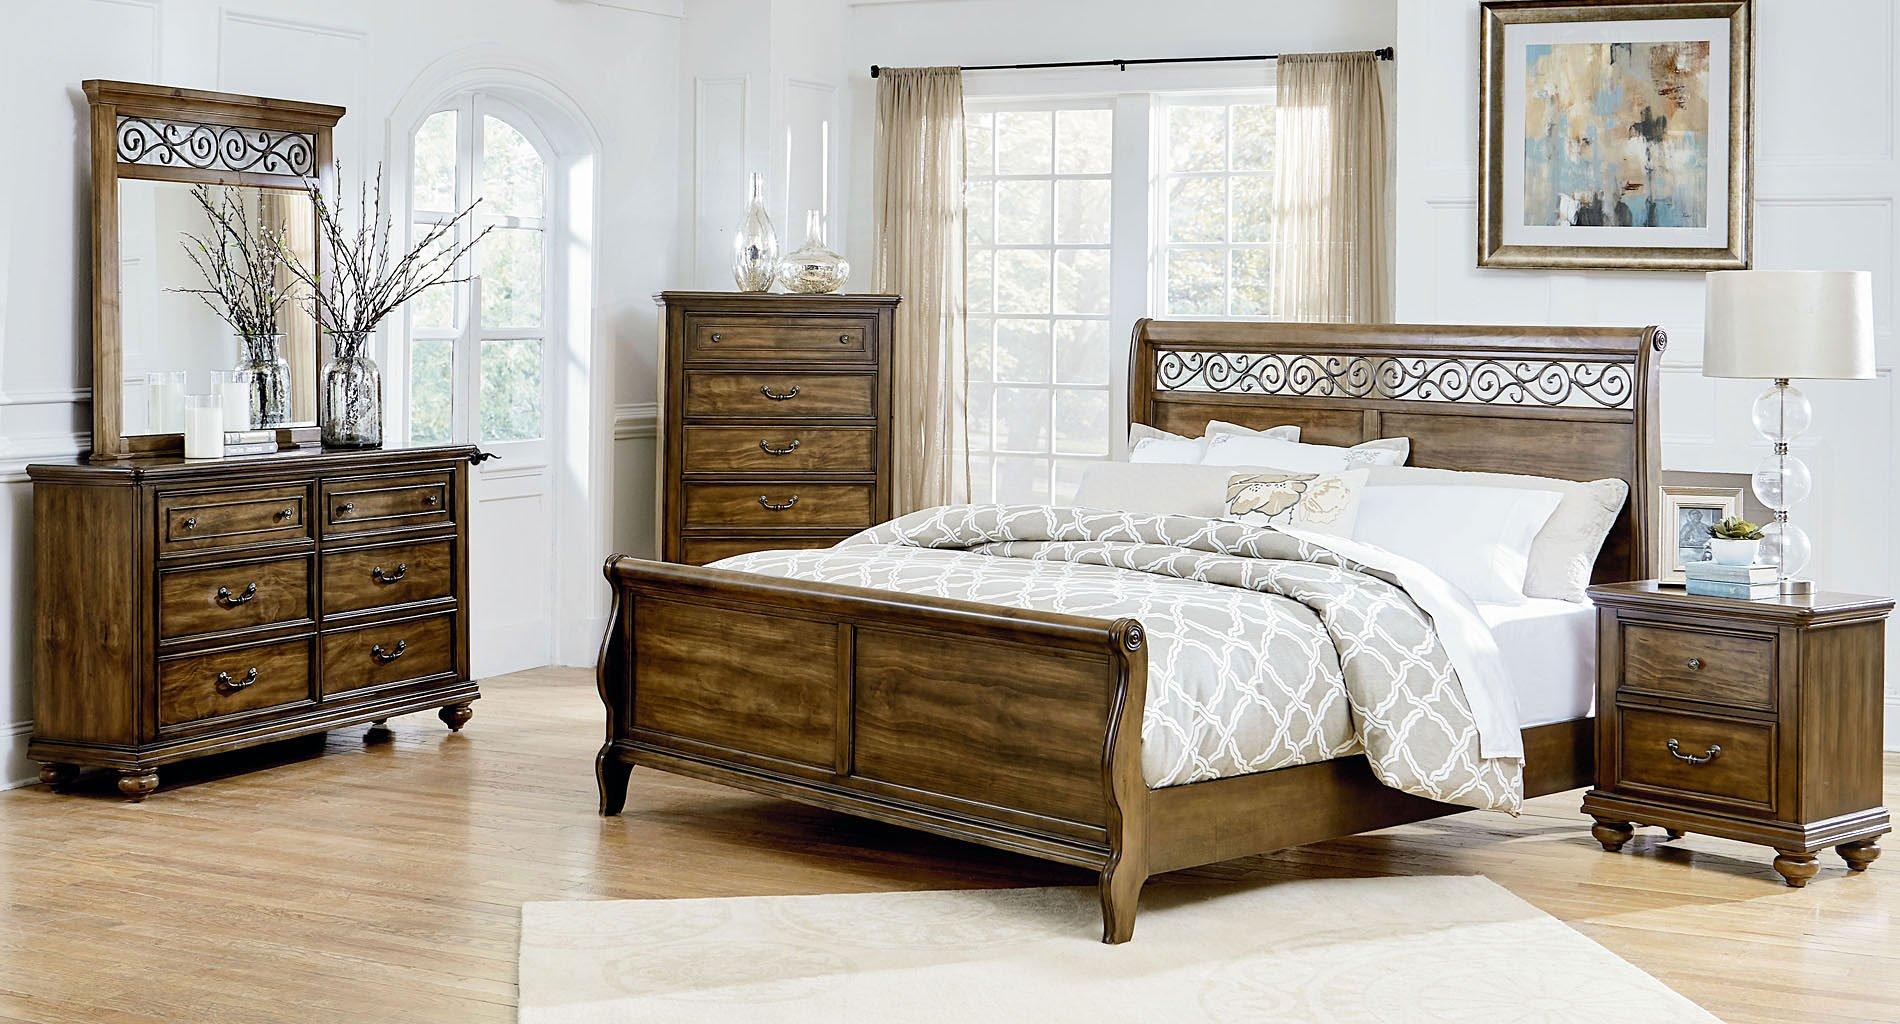 monterey sleigh bedroom set standard furniture furniture cart. Black Bedroom Furniture Sets. Home Design Ideas